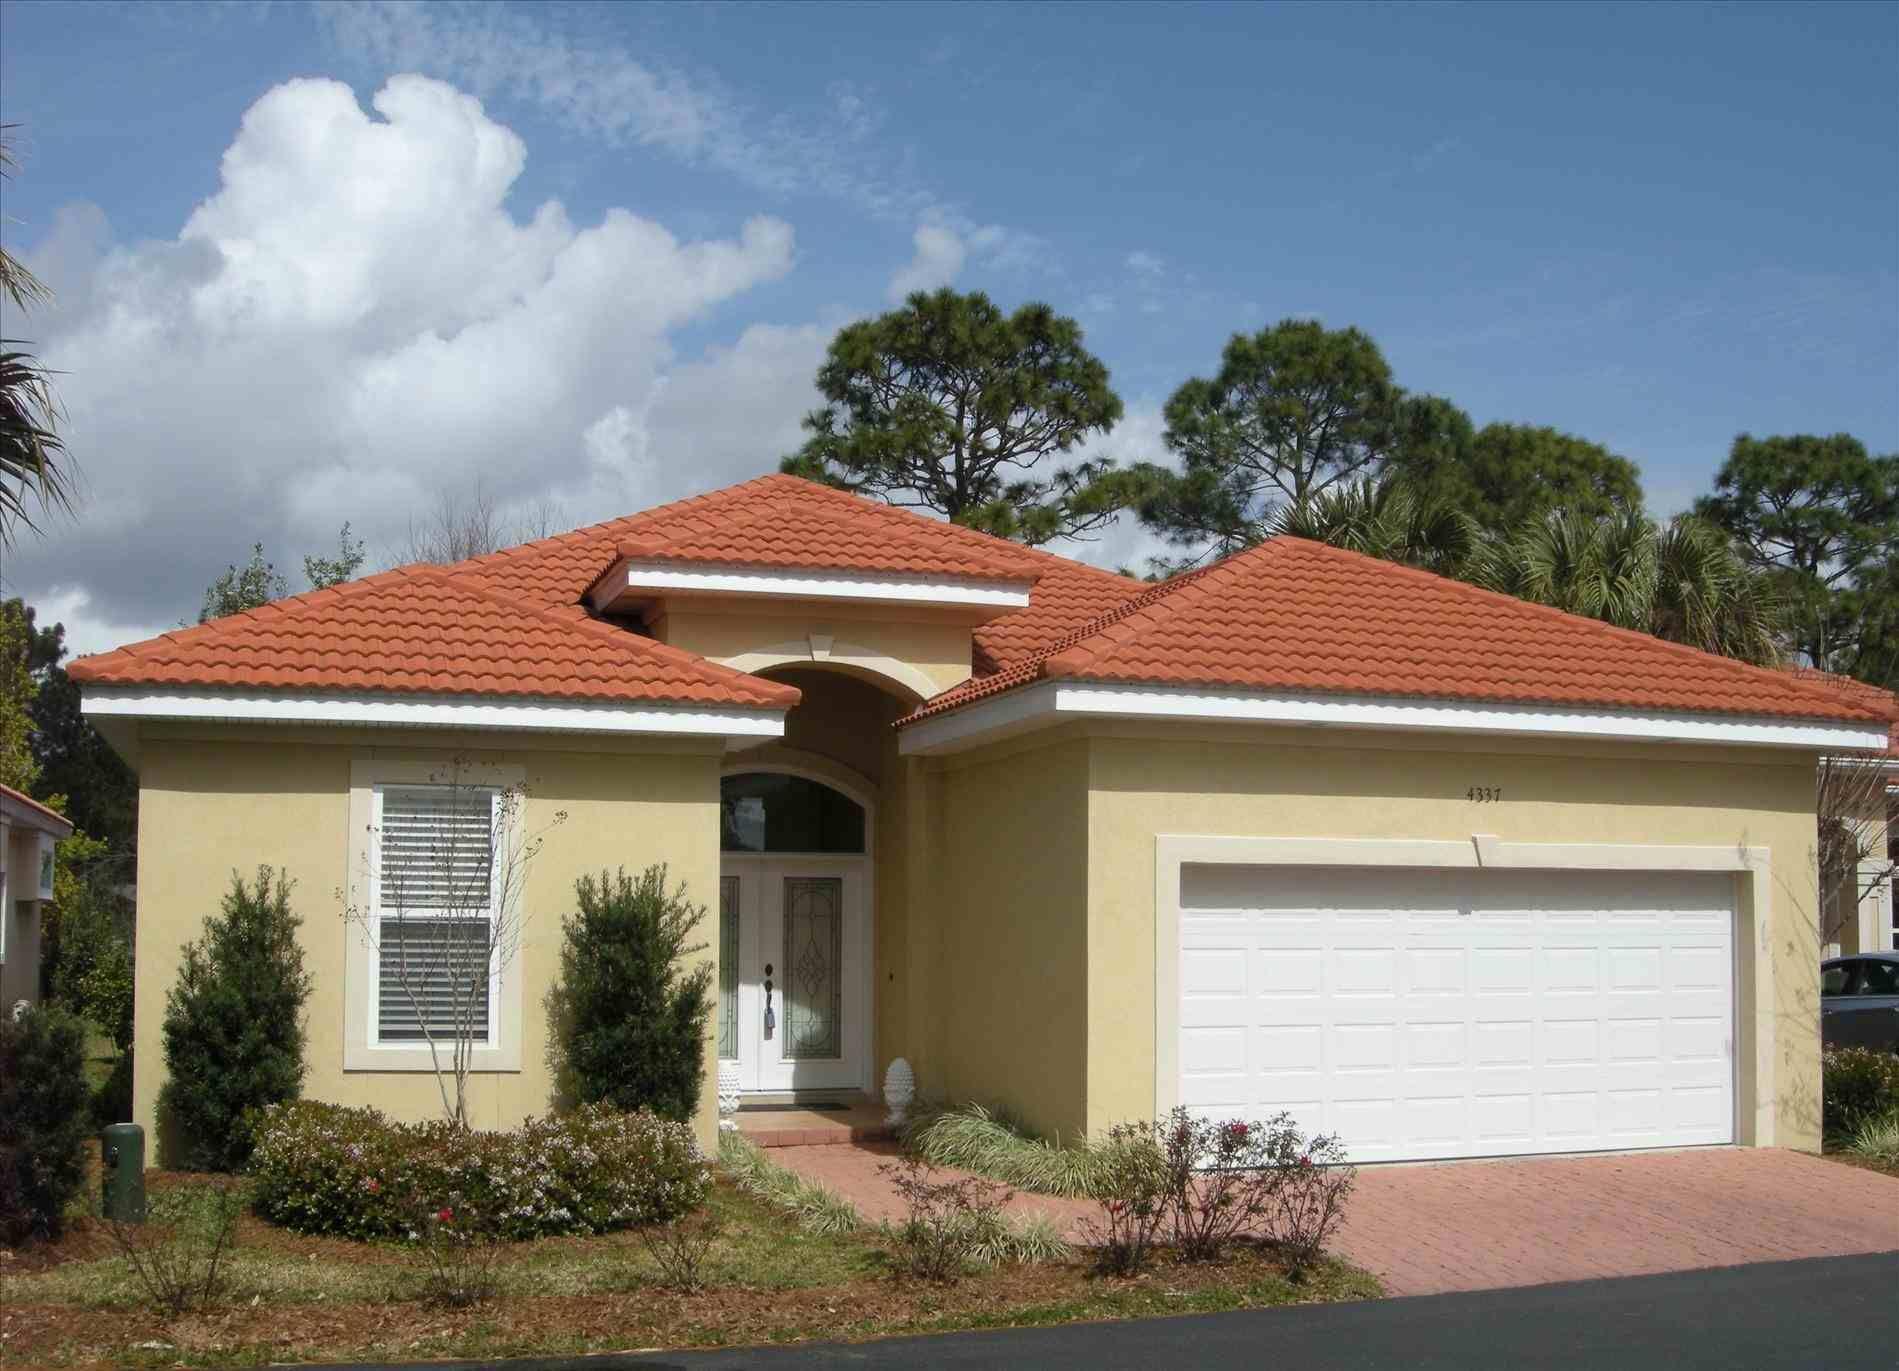 Roofing Top Garage | Modern minecraft houses, Modern house ...